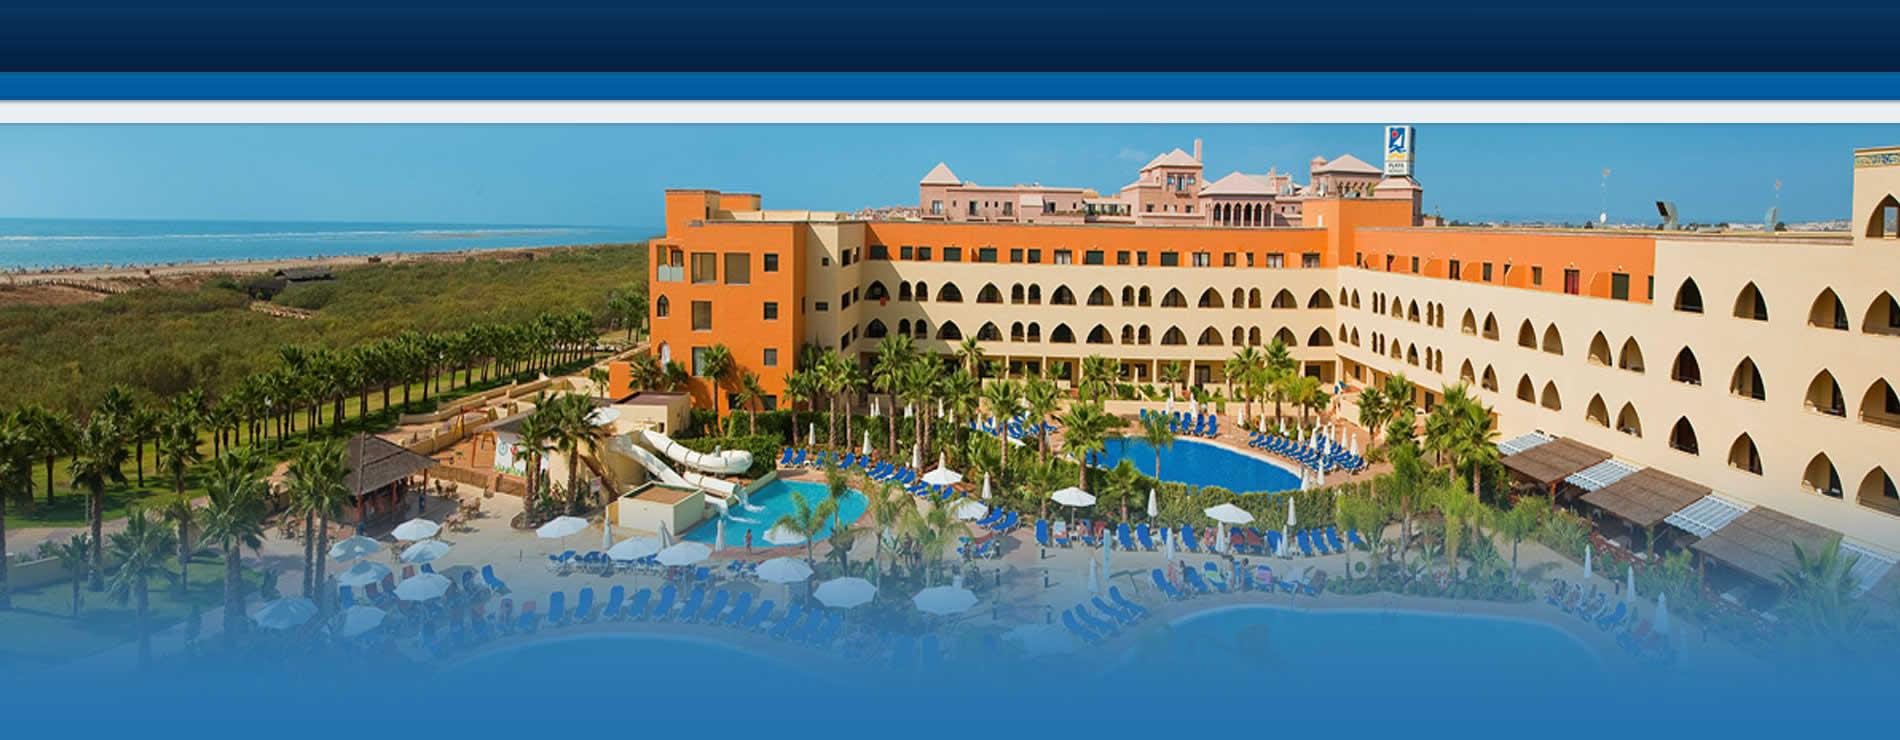 OFERTA APERTURA Playa Marina Spa Hotel